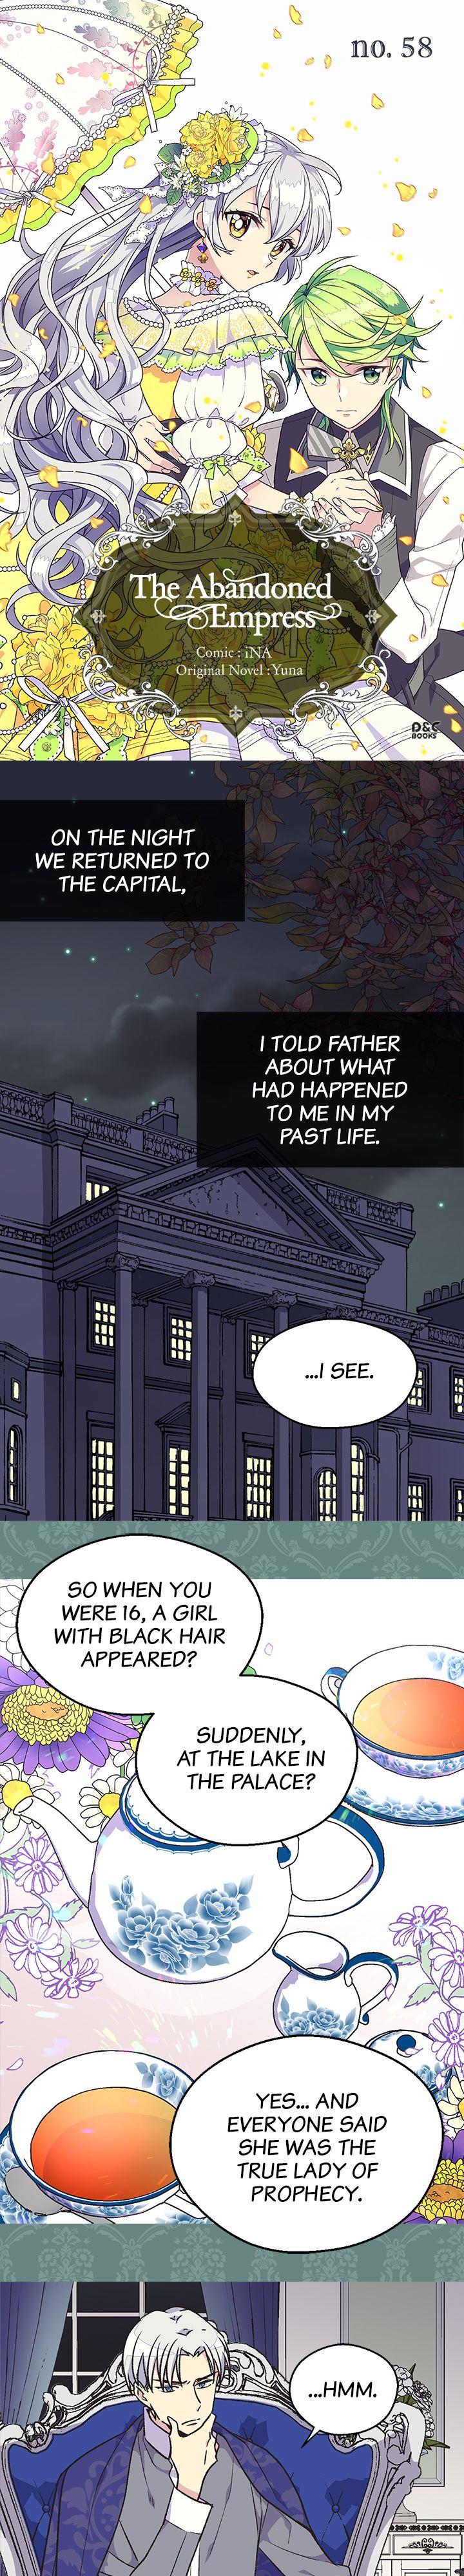 https://img2.nineanime.com/comics/pic2/22/23126/734515/2410710d244bb39e9fe6c7387f5681ab.jpg Page 1